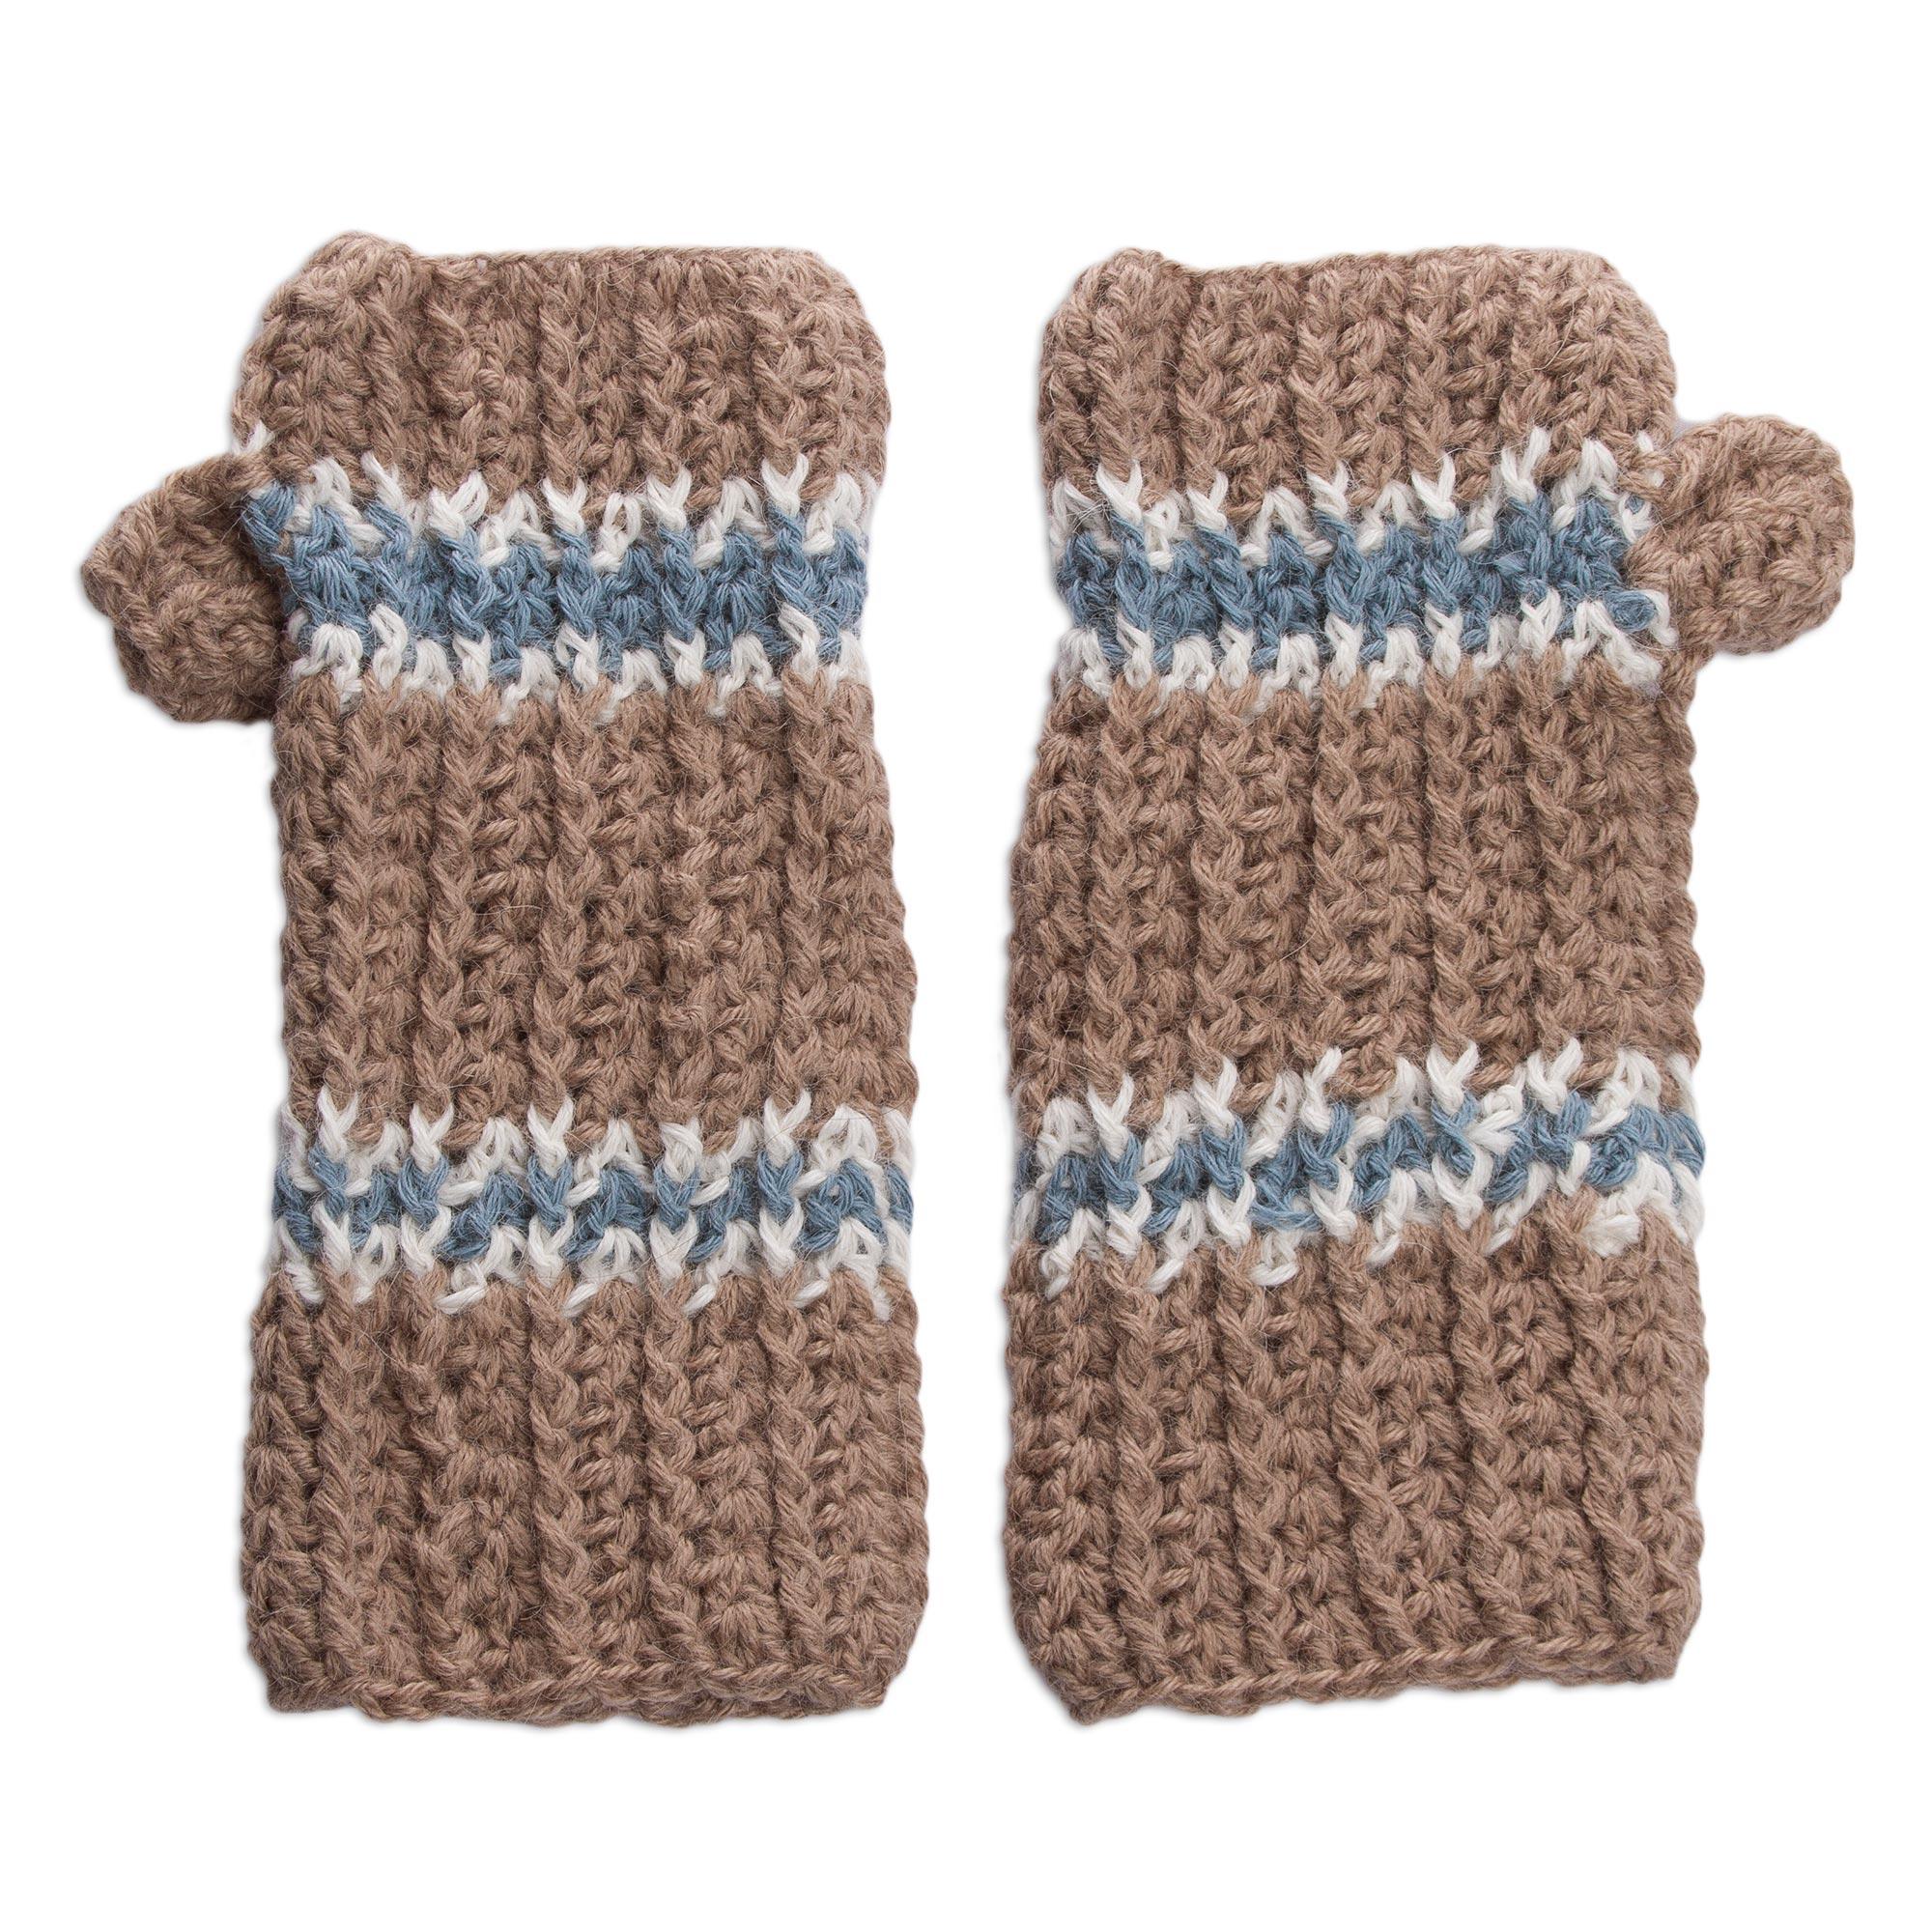 Alpaca Mittens Knitting Pattern : Unicef UK Market Alpaca Mittens Hand Knit Fingerless Gloves from Peru - And...